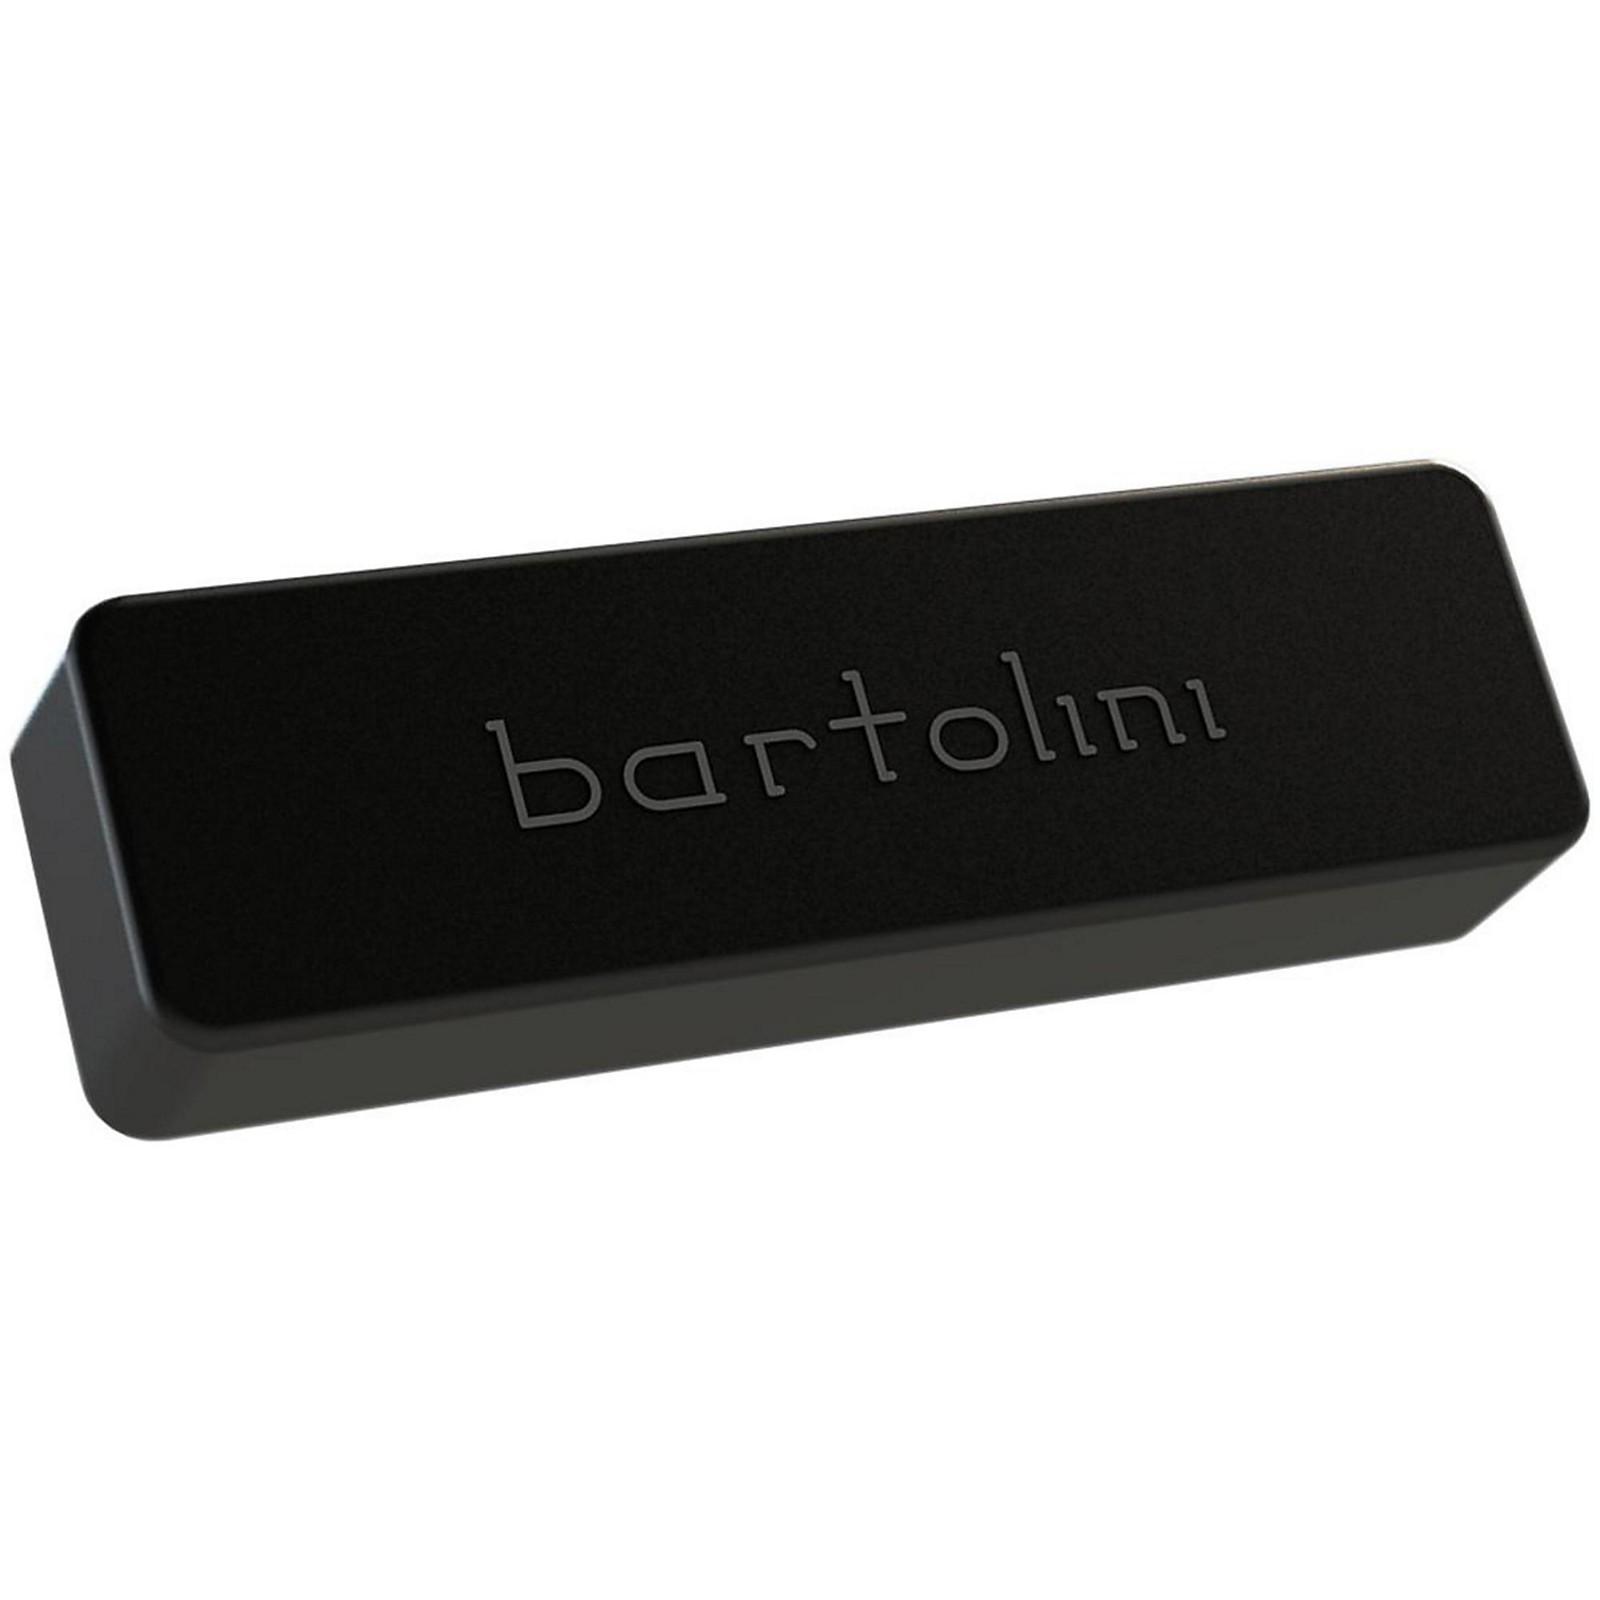 Bartolini BRPXXP26M-B Original P2 Split Coil Deep Tone Neck 6-String Bass Pickup